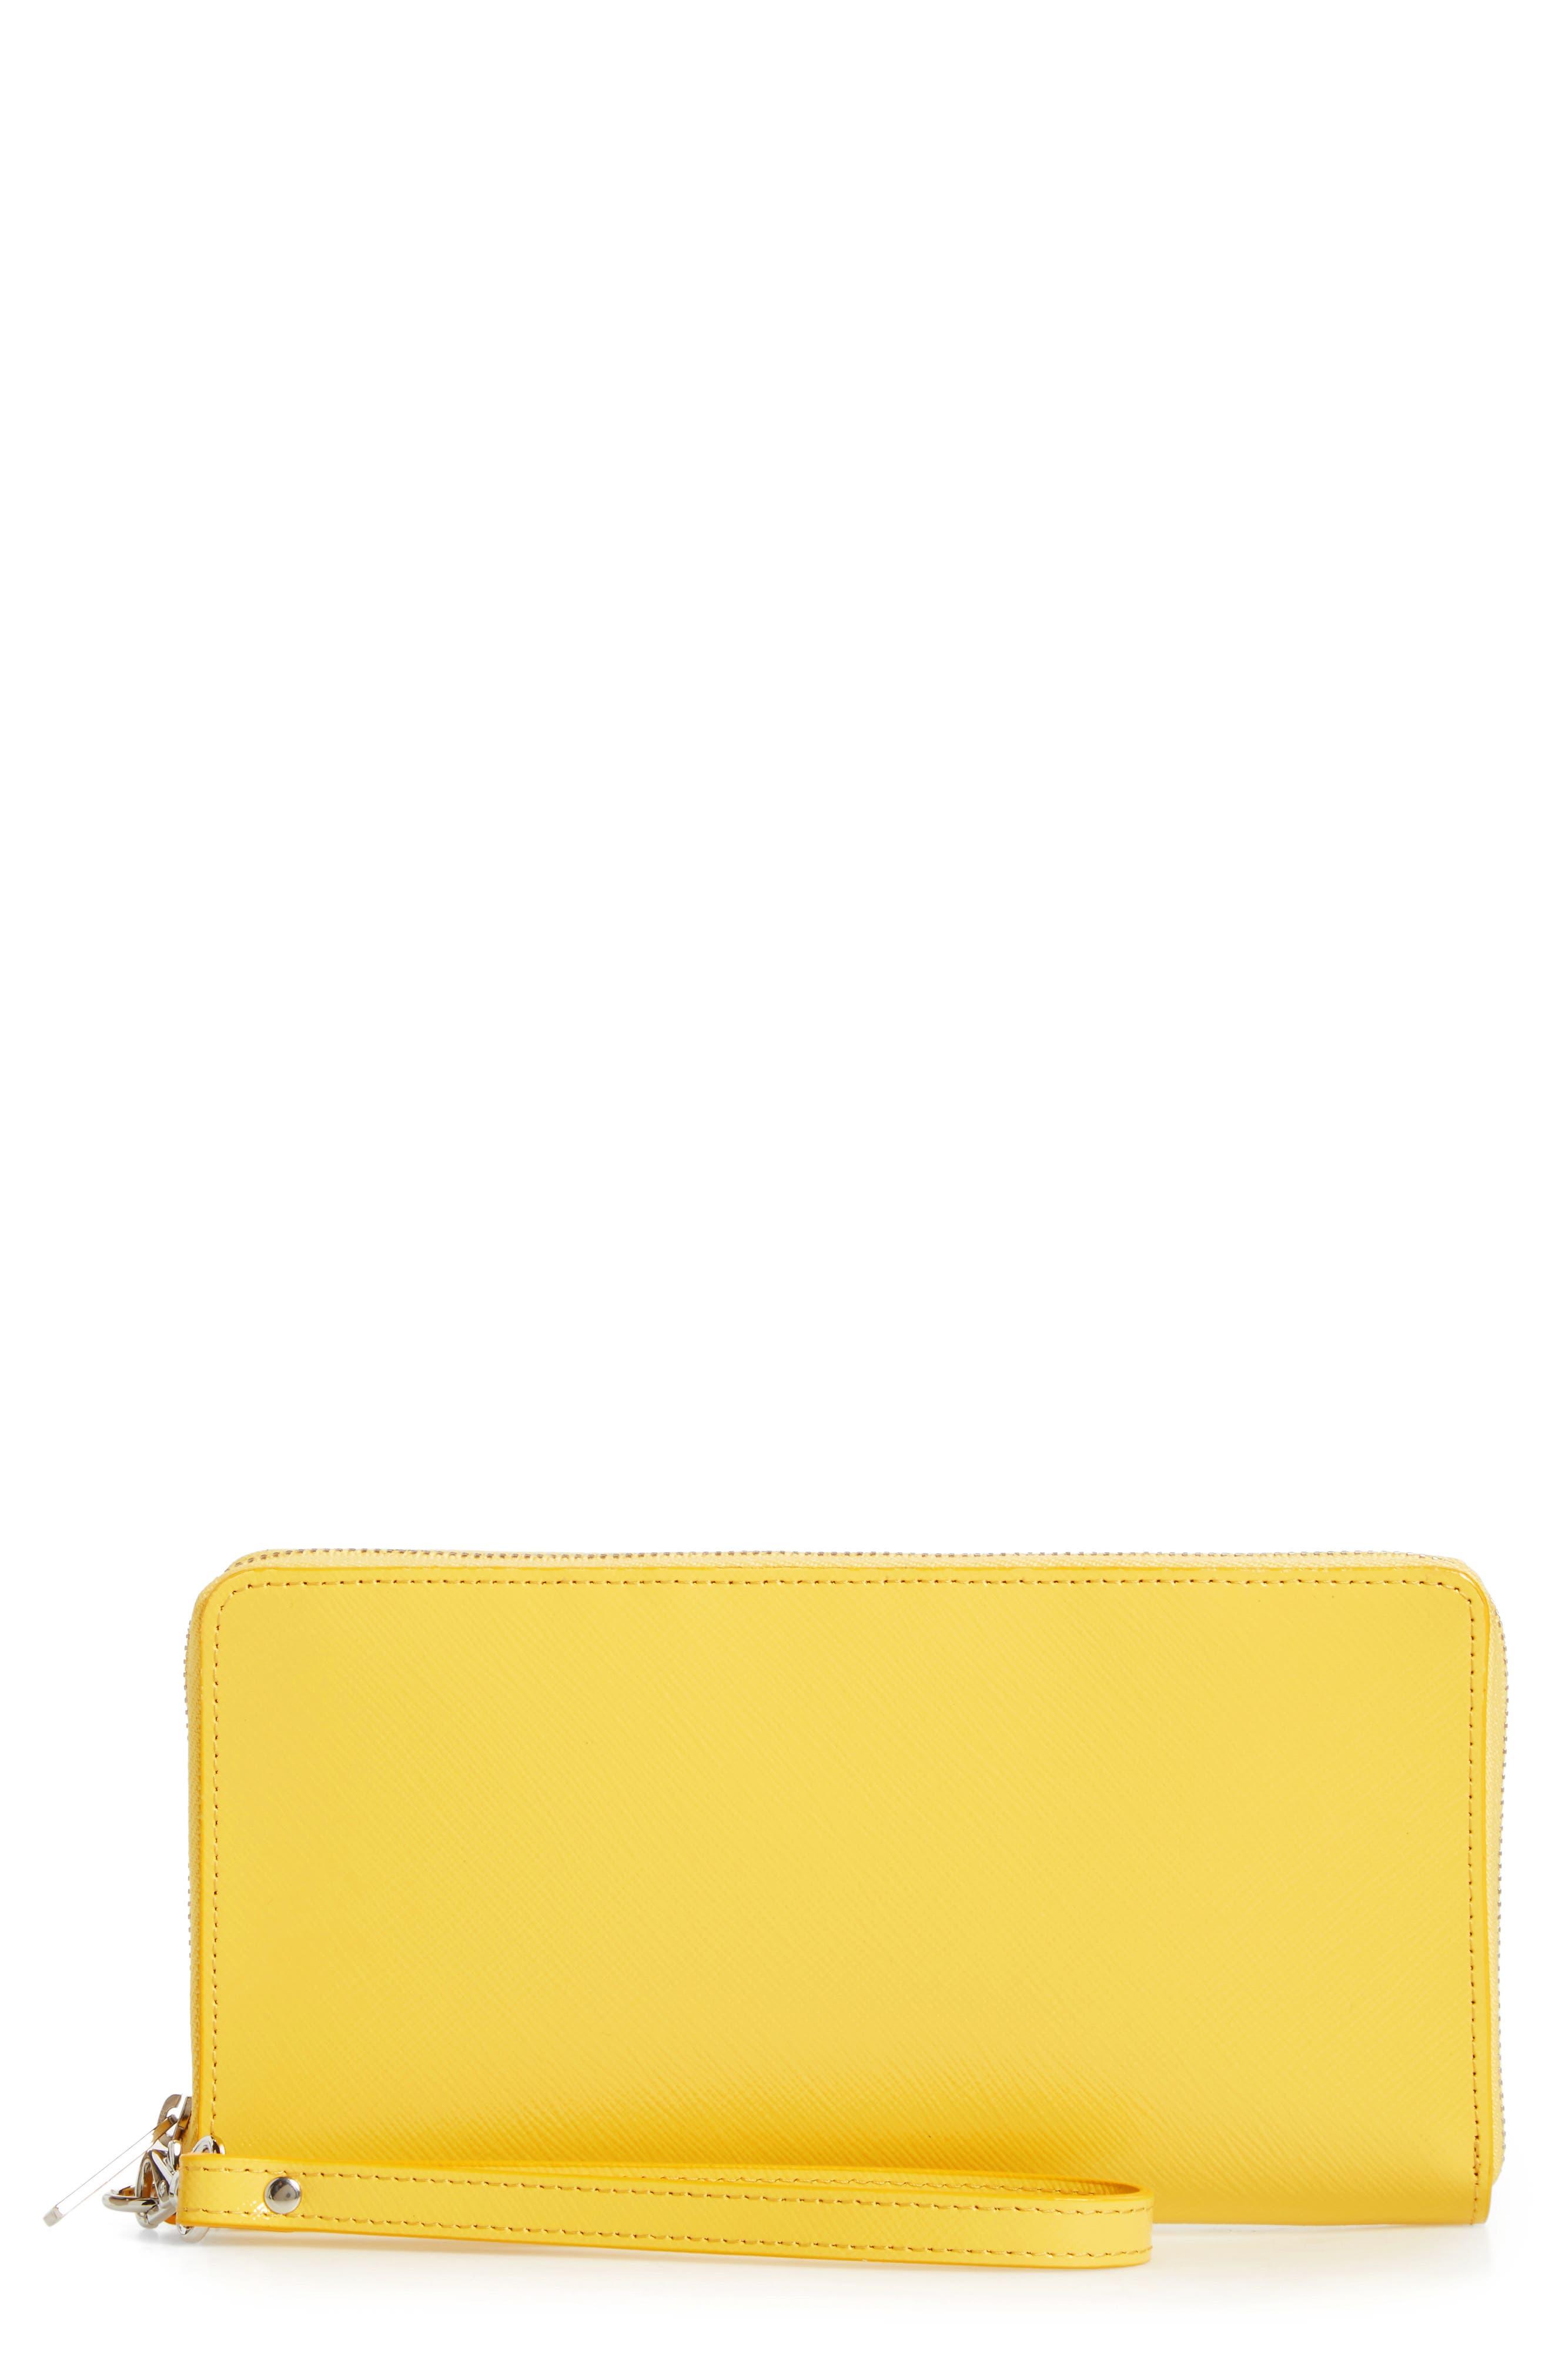 Main Image - Nordstrom Leather Zip Around Wallet